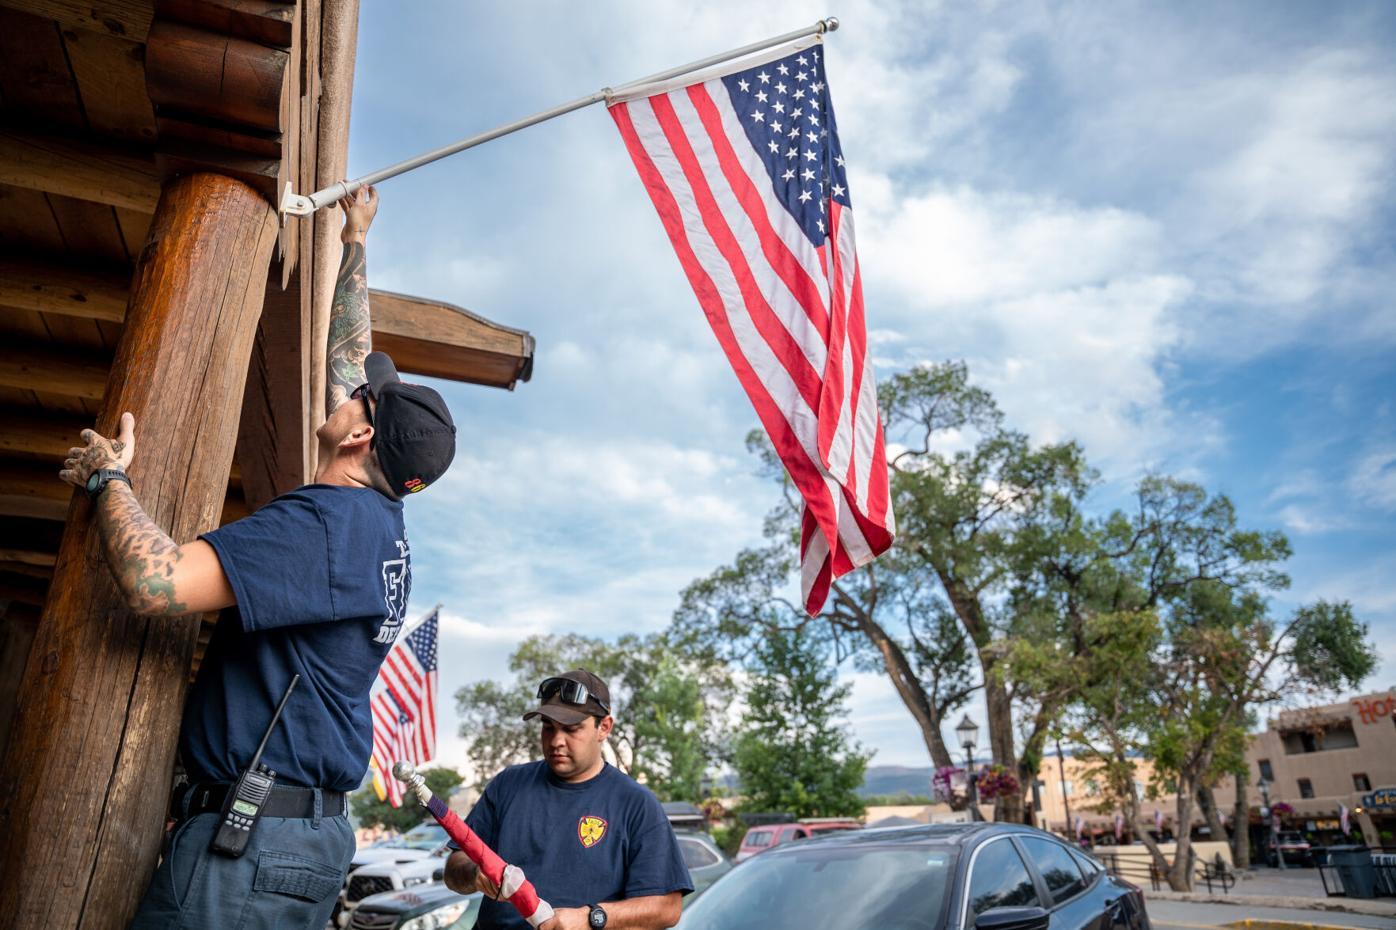 Taos Volunteer Fire Department honors the fallen